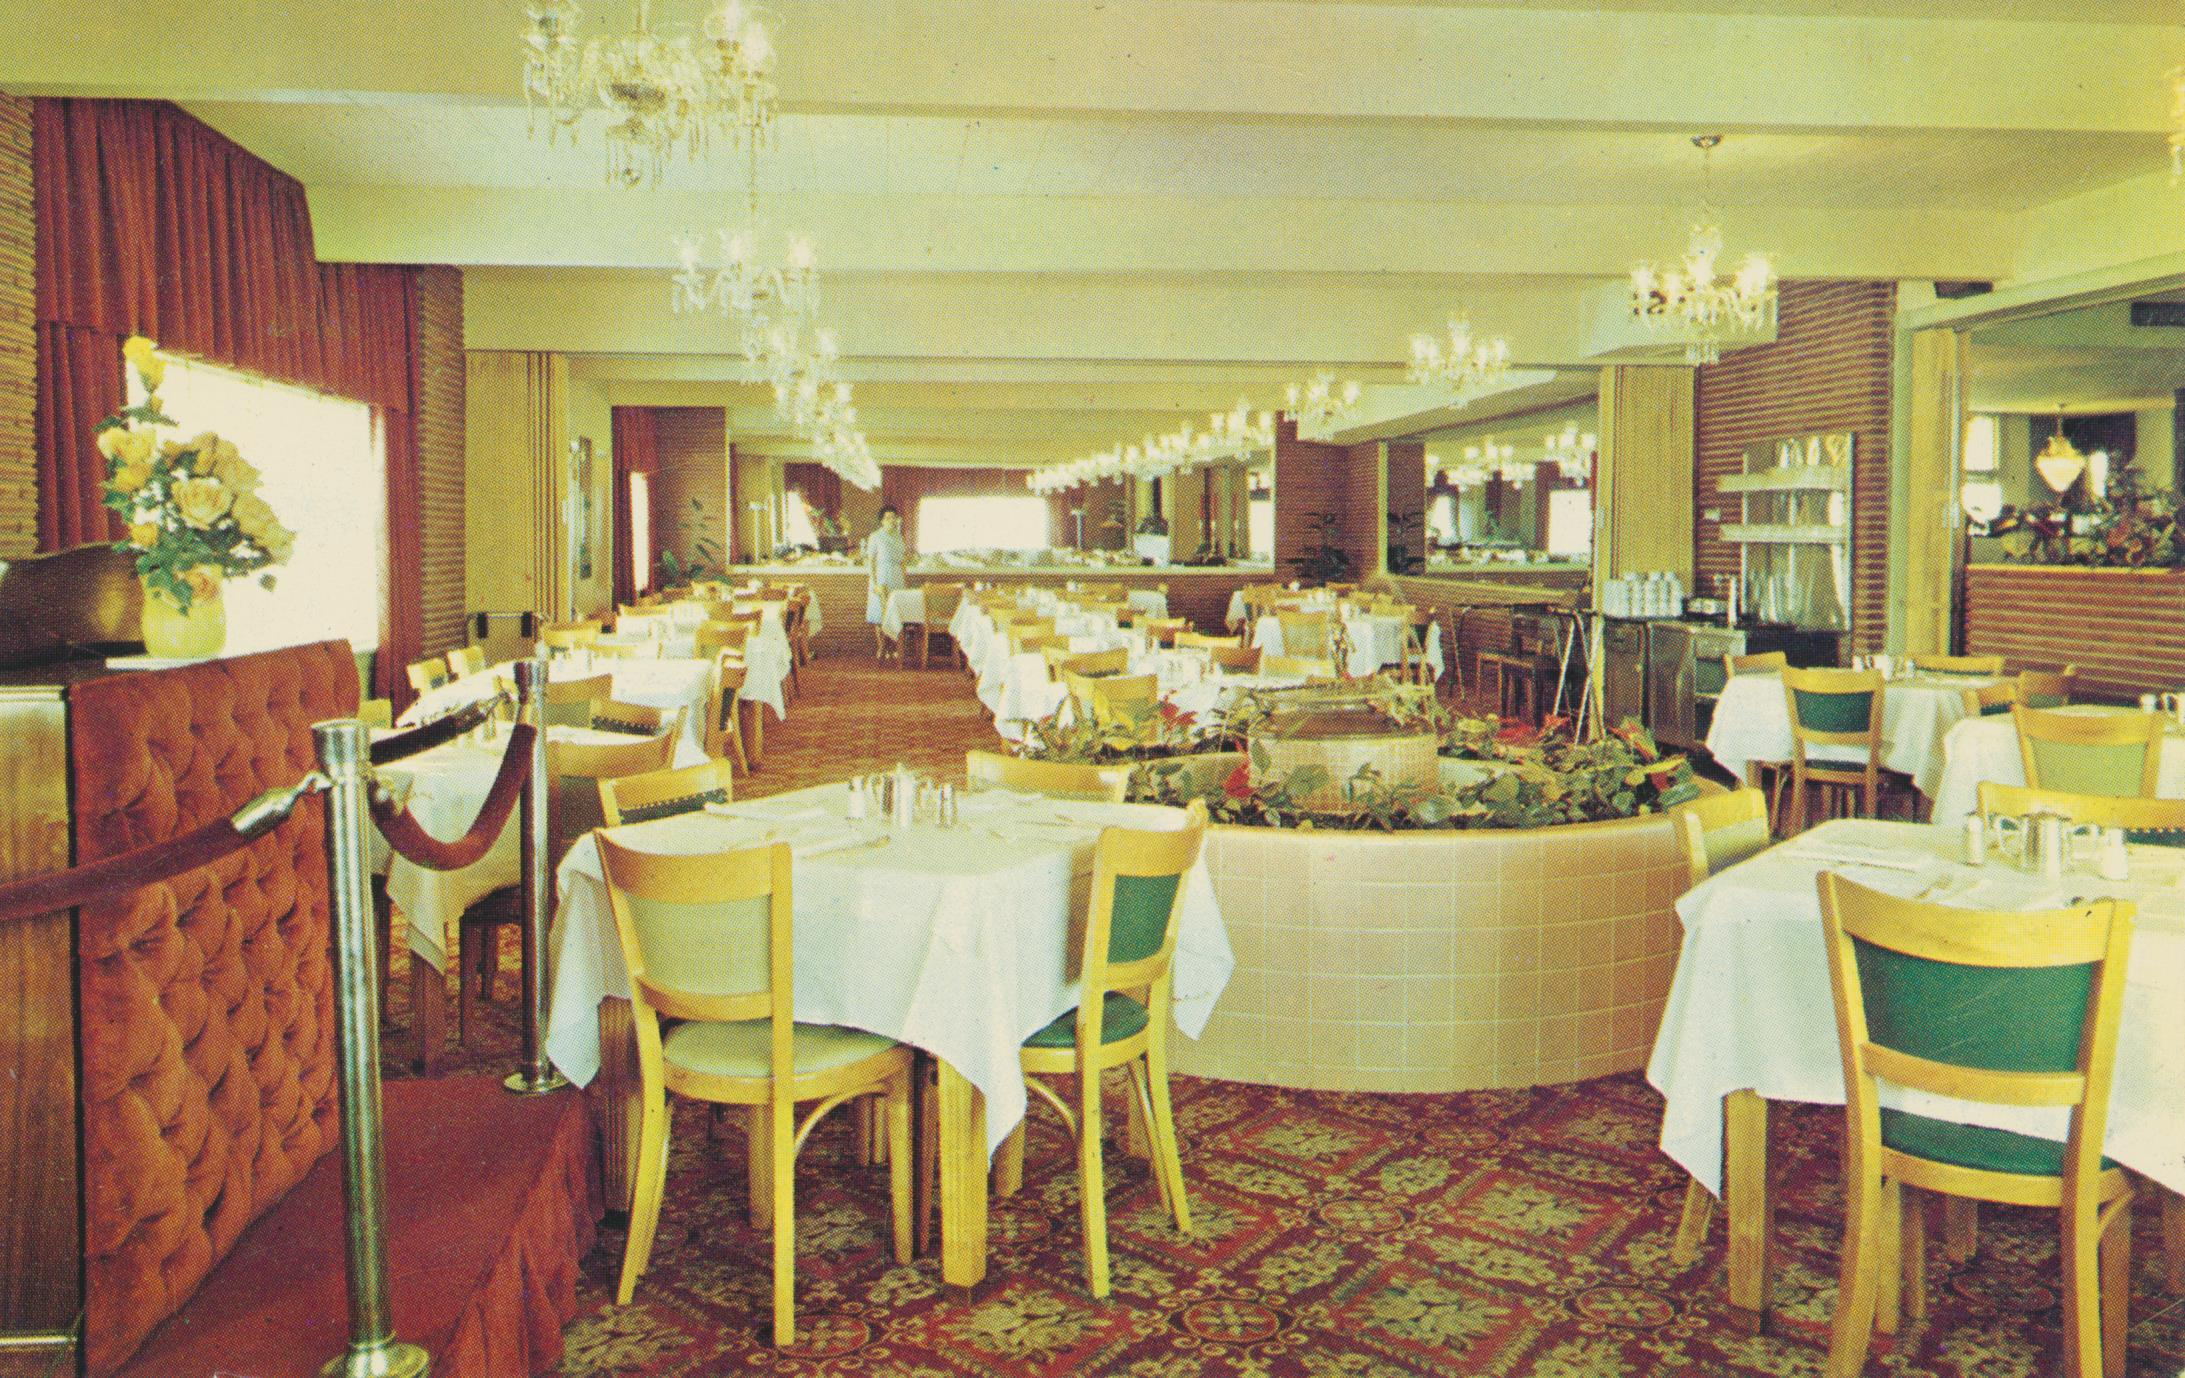 Monte Cristo Motor Court Dining Room - Grenada, Mississippi